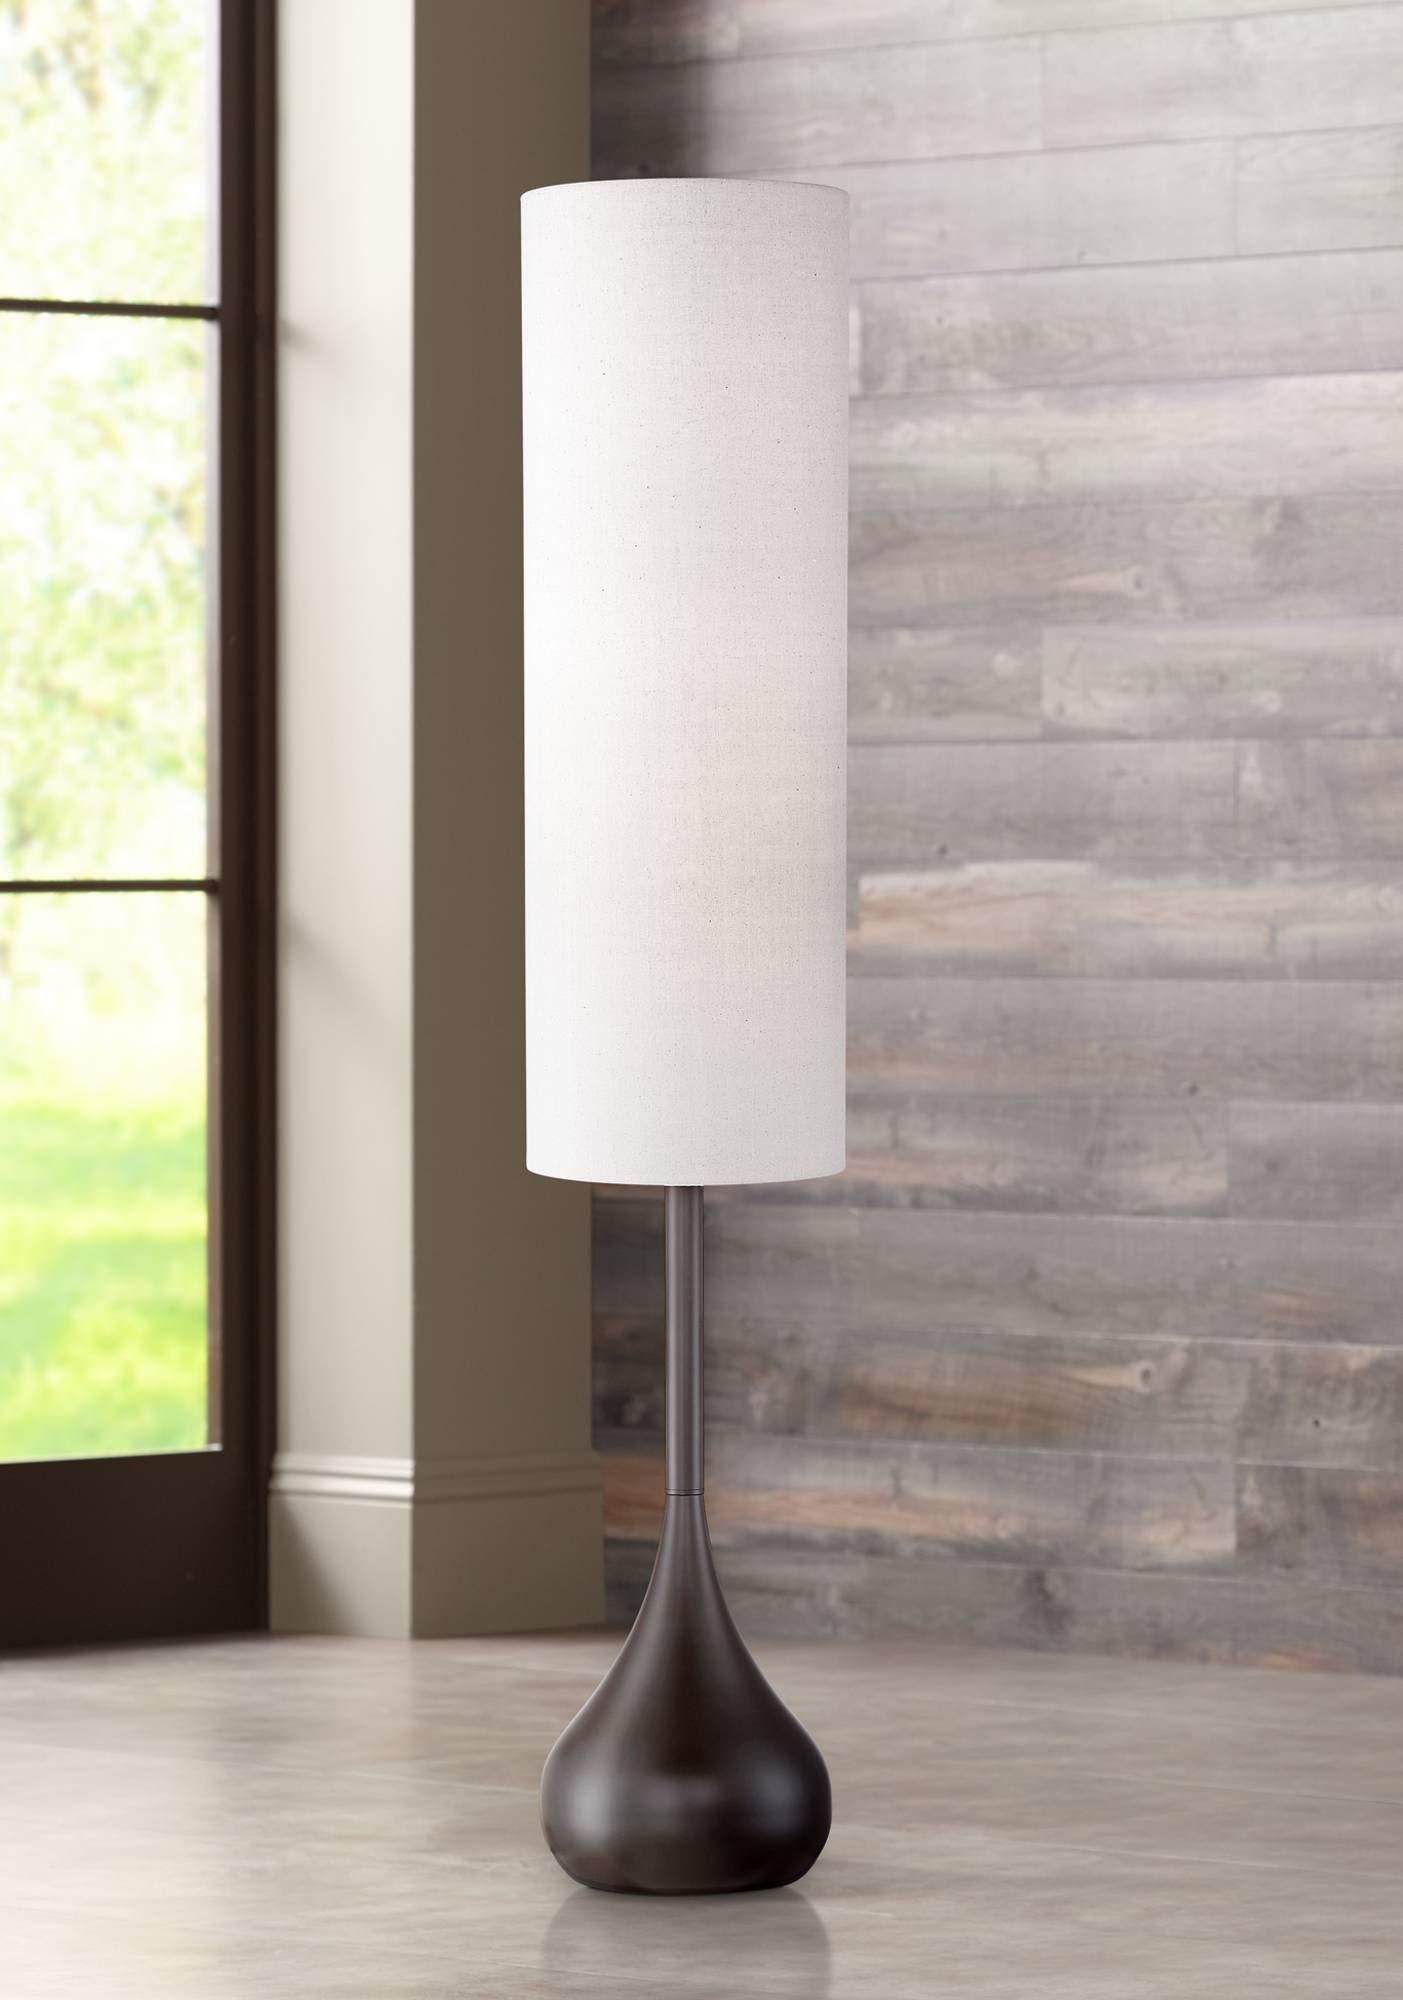 Possini Euro Design Moderne Mid Century Modern Floor Lamp Bronze Metal Droplet Off-White Cream Cylinder Shade for Living Room Reading - Possini Euro Design